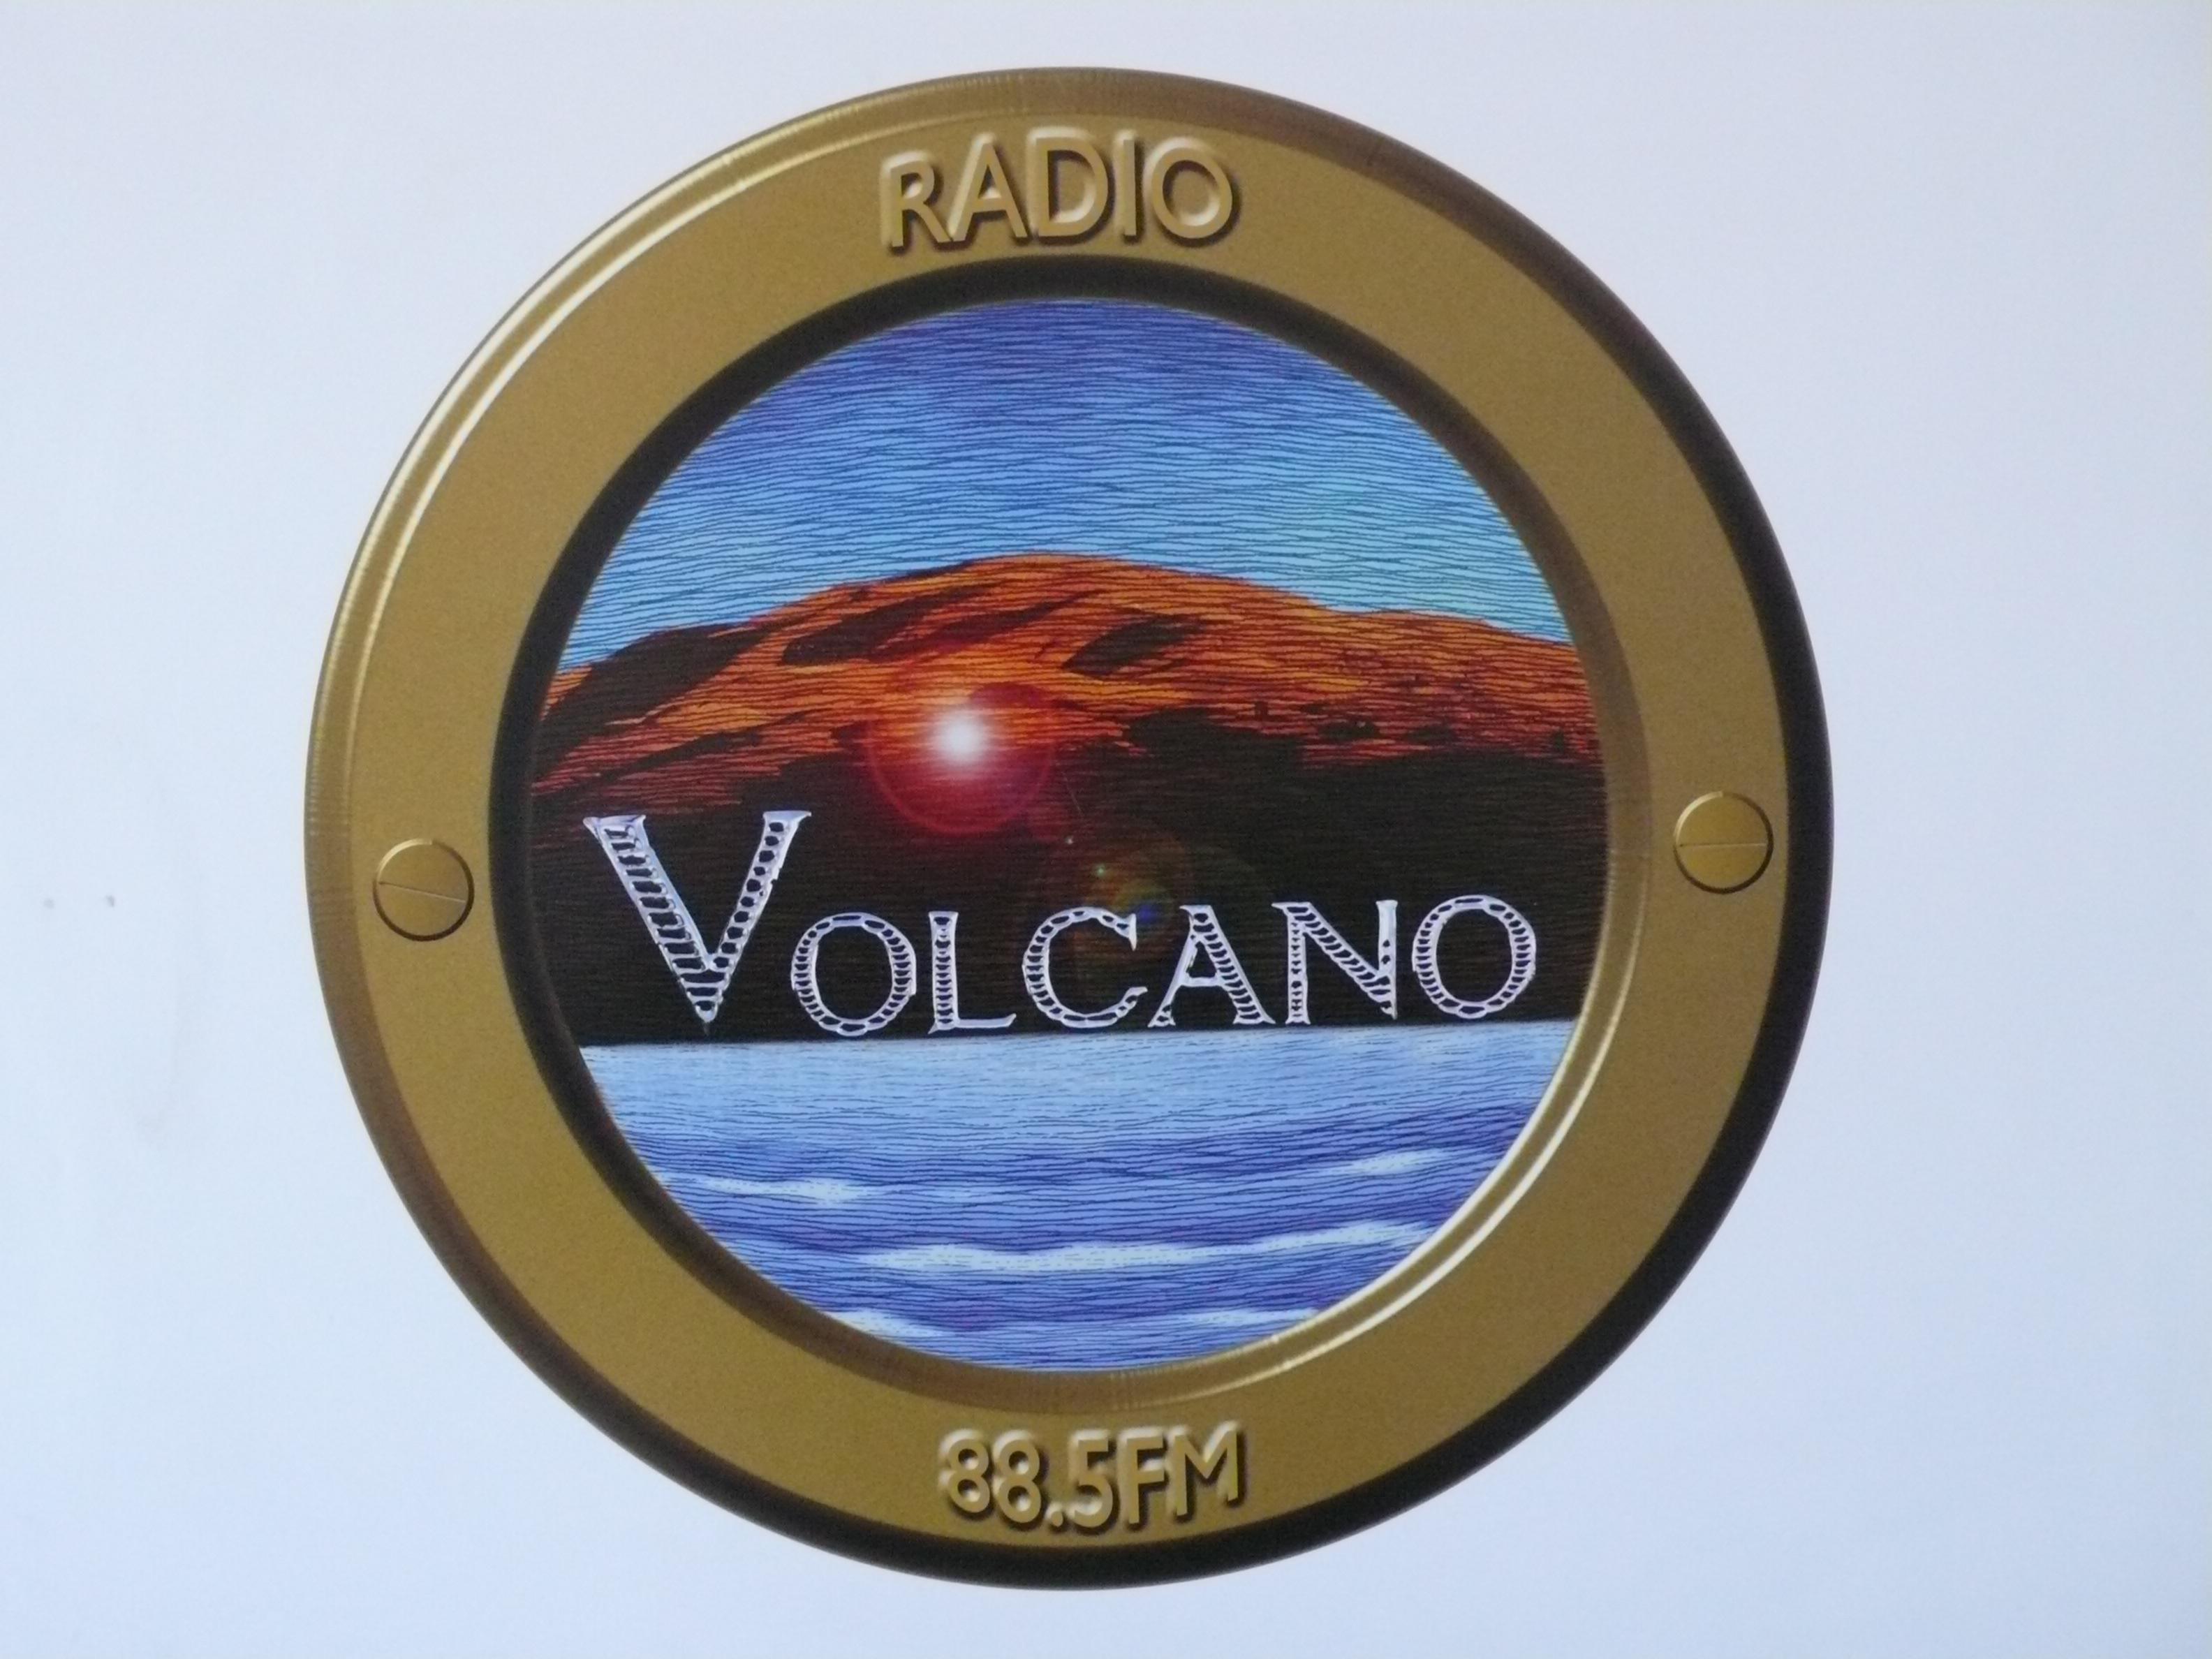 Volcano Radio - Lyttelton